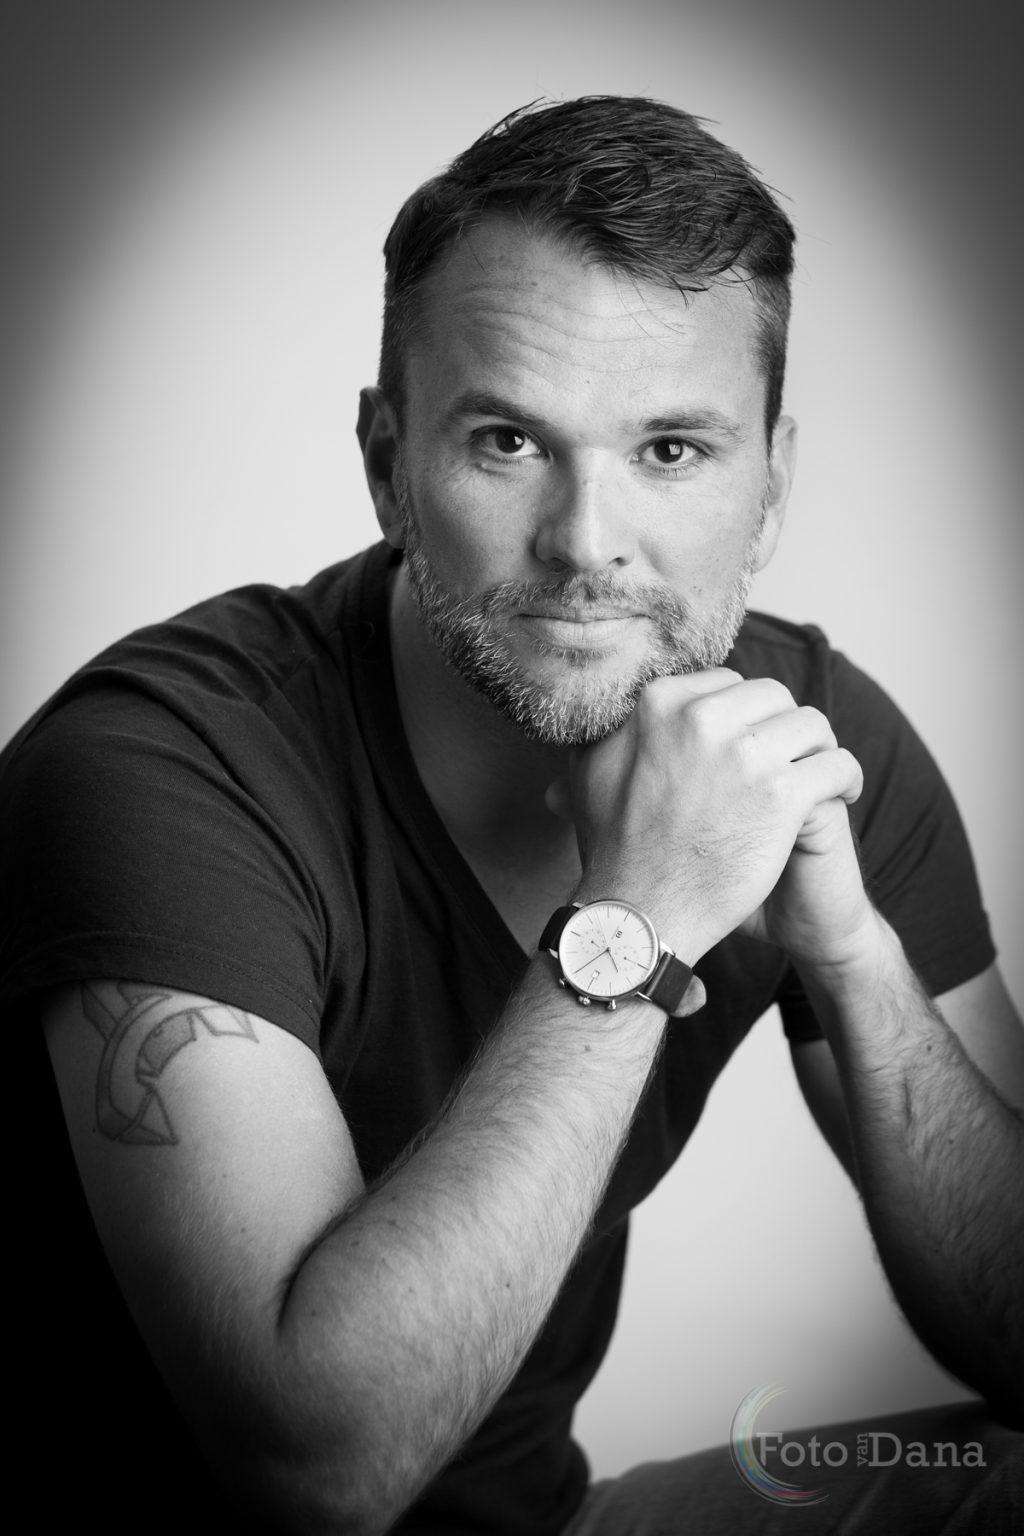 stoere zwart-wit profielfoto man met tattoo